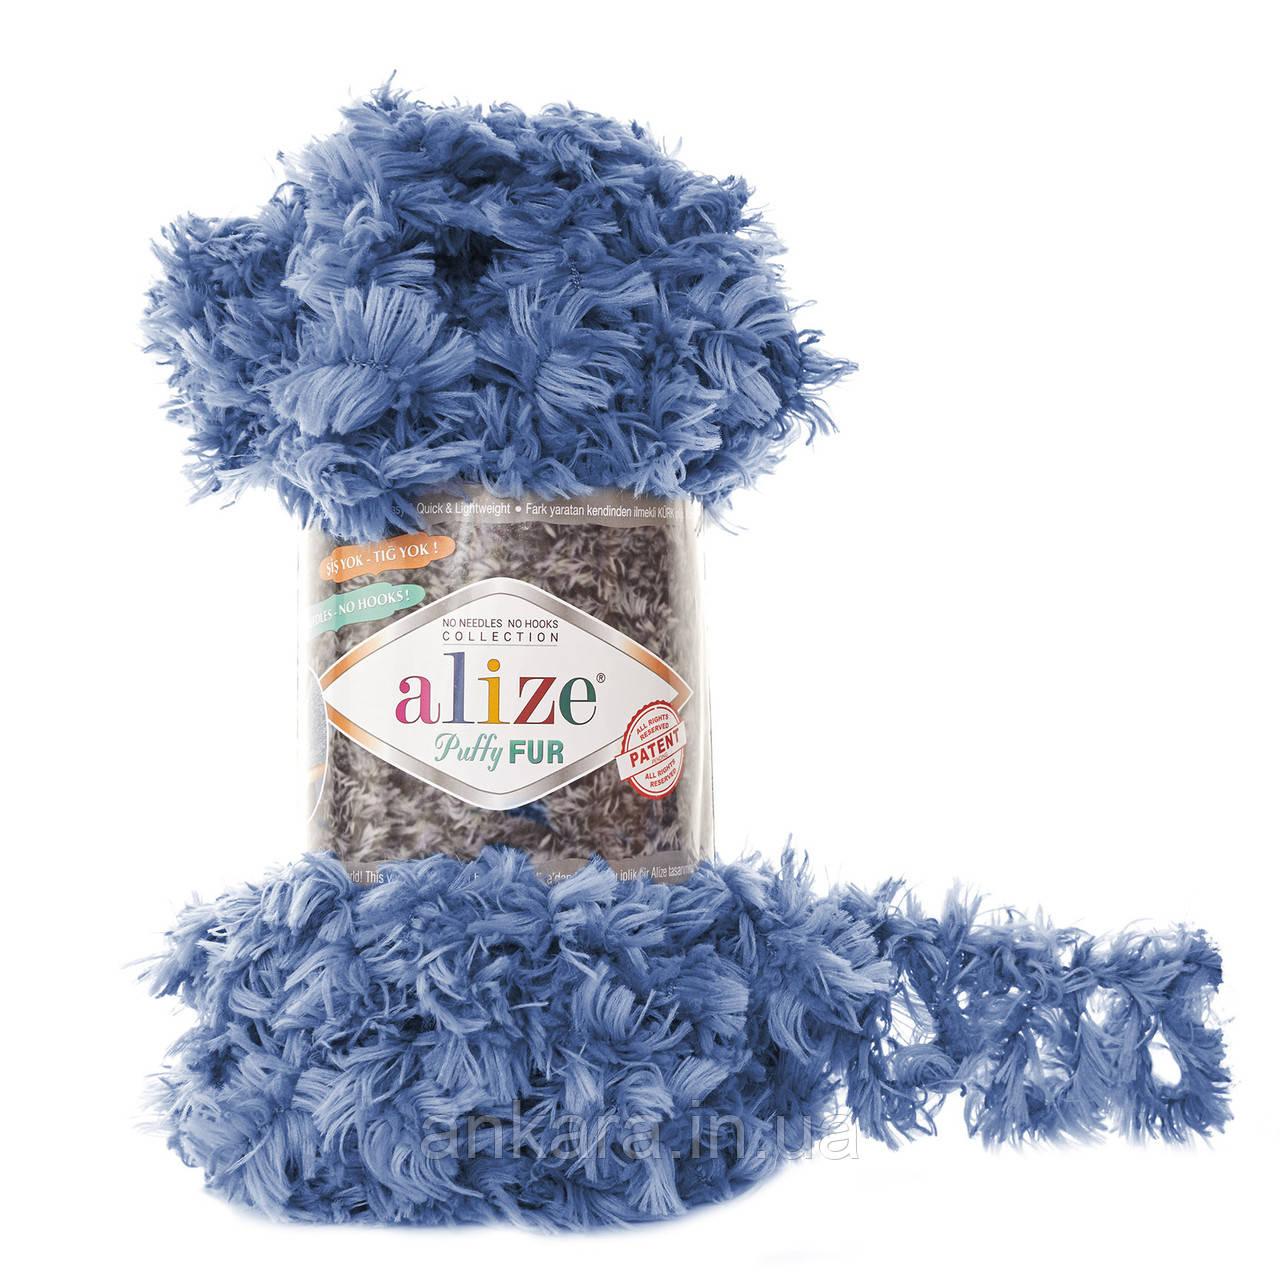 Alize Puffy Fur 6116